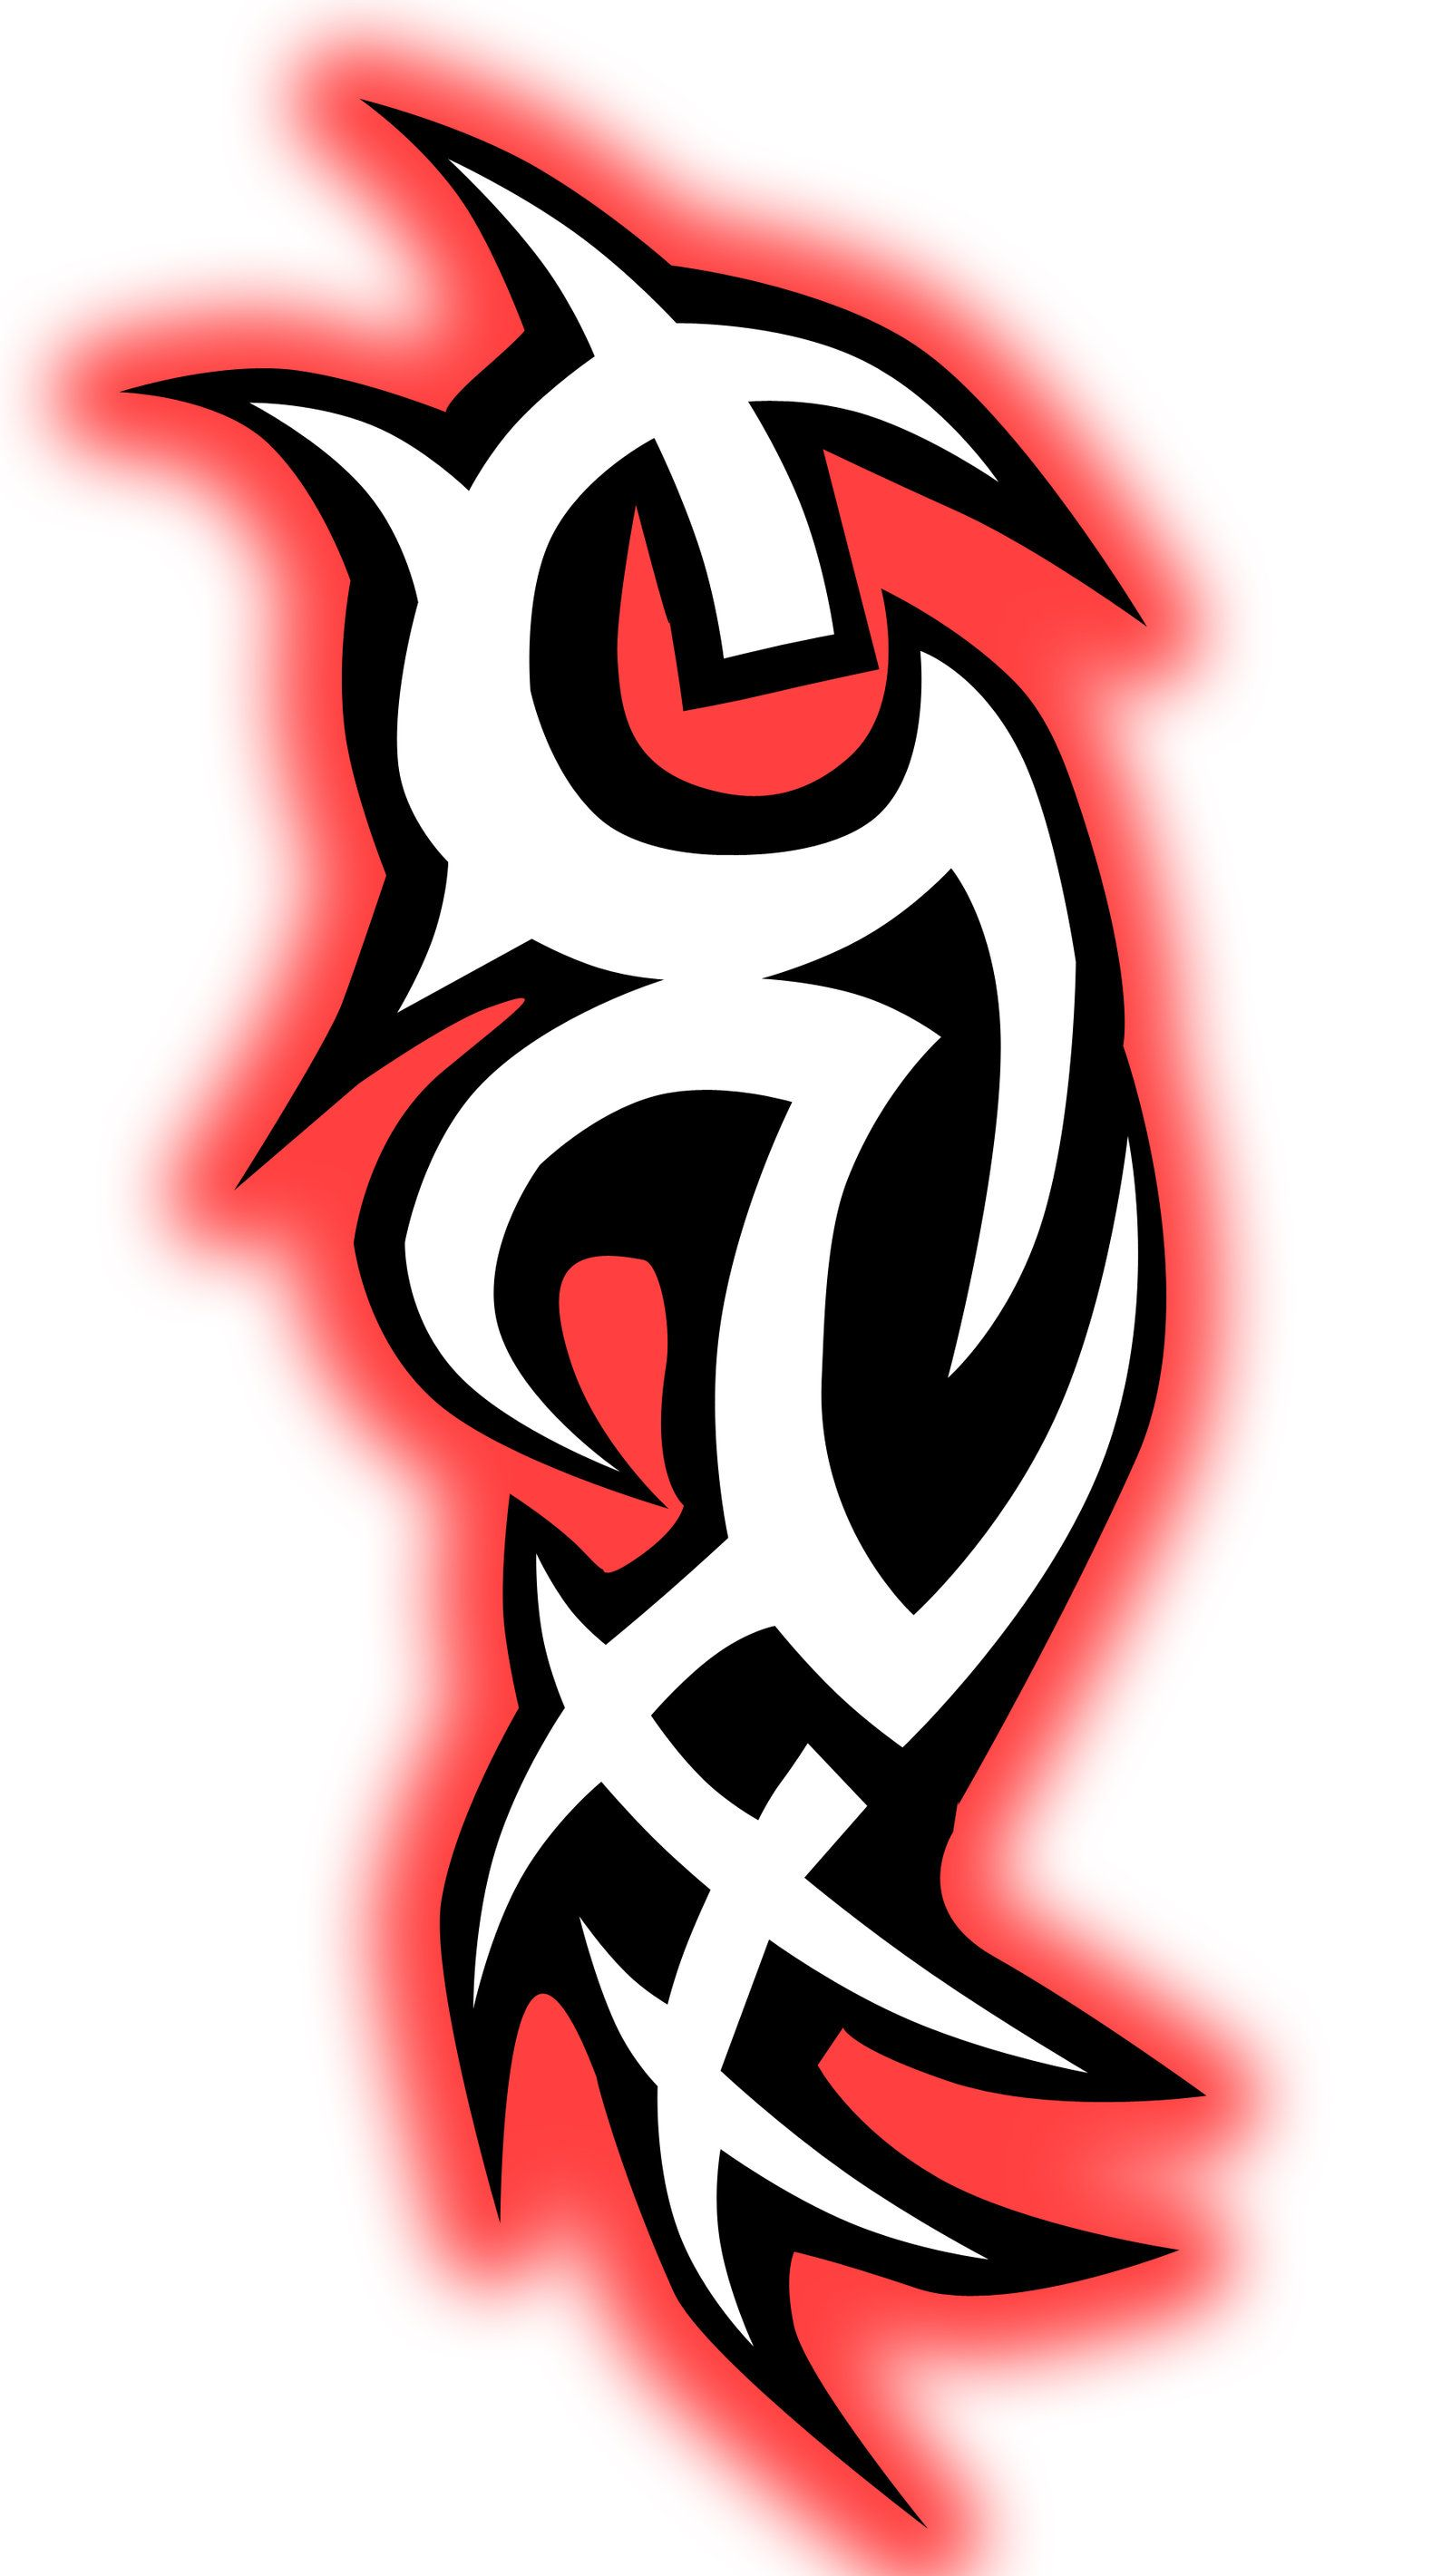 30 of the best virgo tattoo designs tattoo easily - Tribal Tattoo Designs Tattoo Tribal Design By Bo H Designs Interfaces Tattoo Design 2007